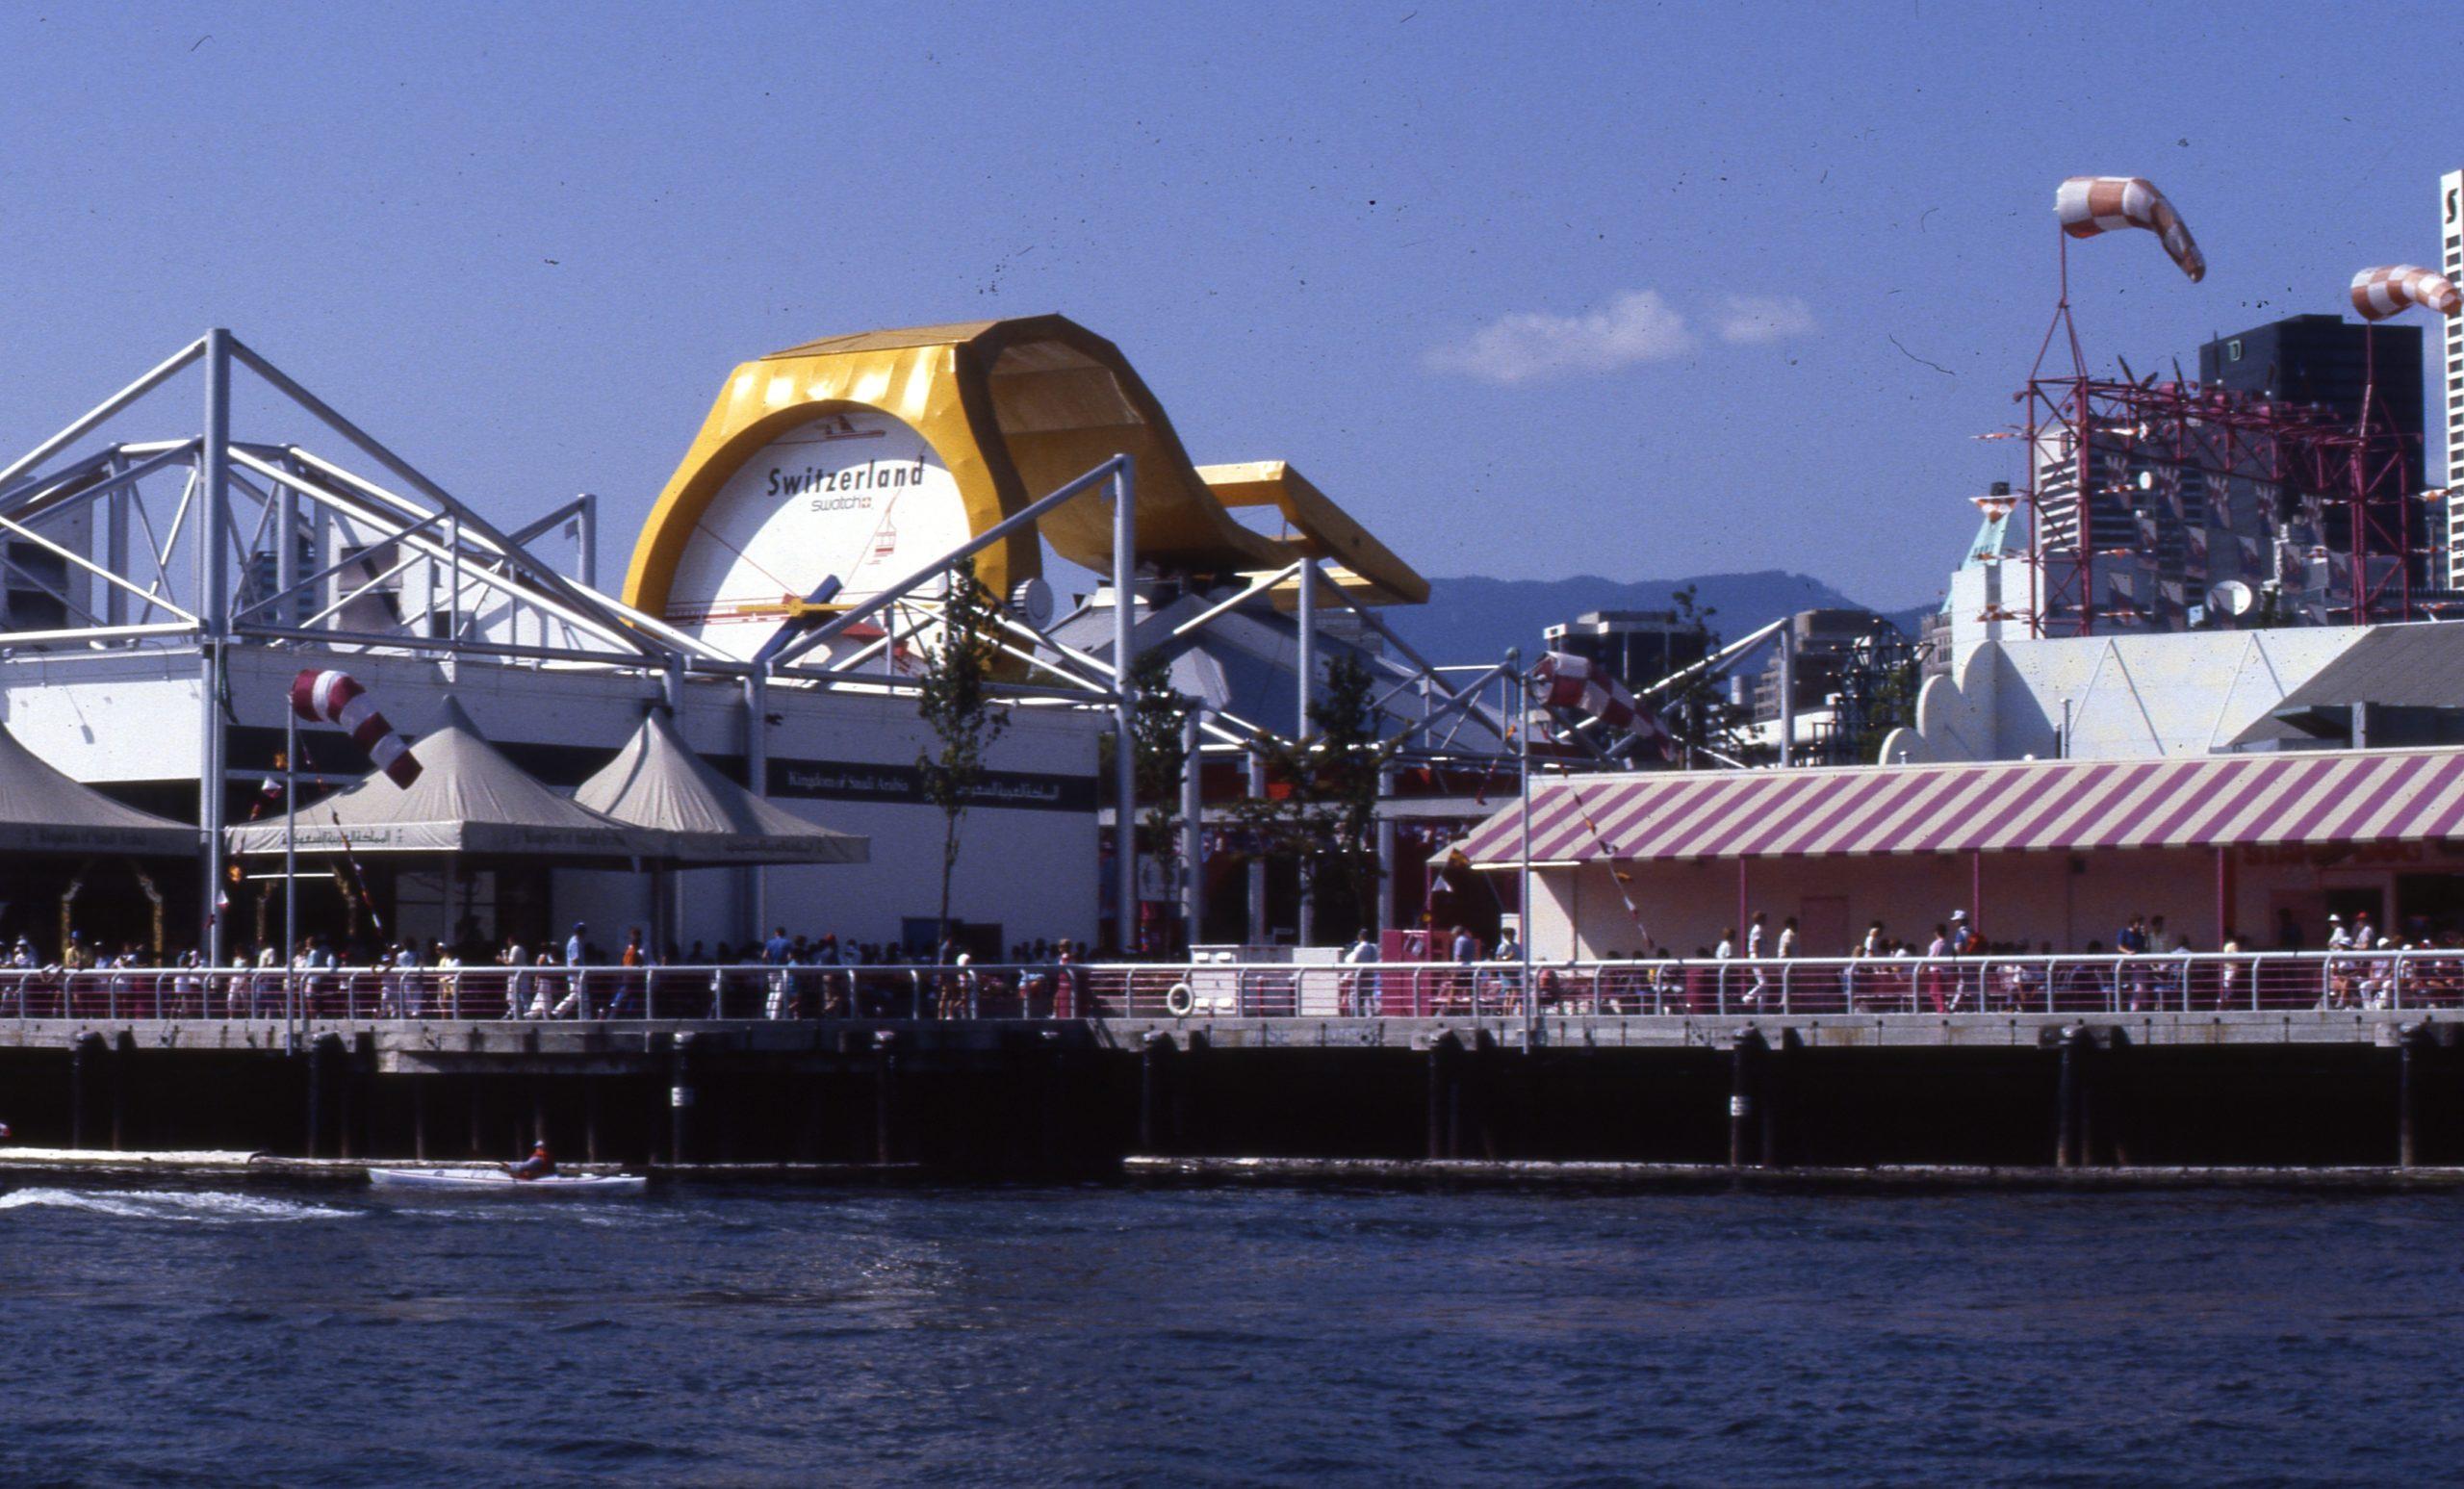 Crowds walk around a harbour. Above a building rises a golden pavillion for Switzerland.